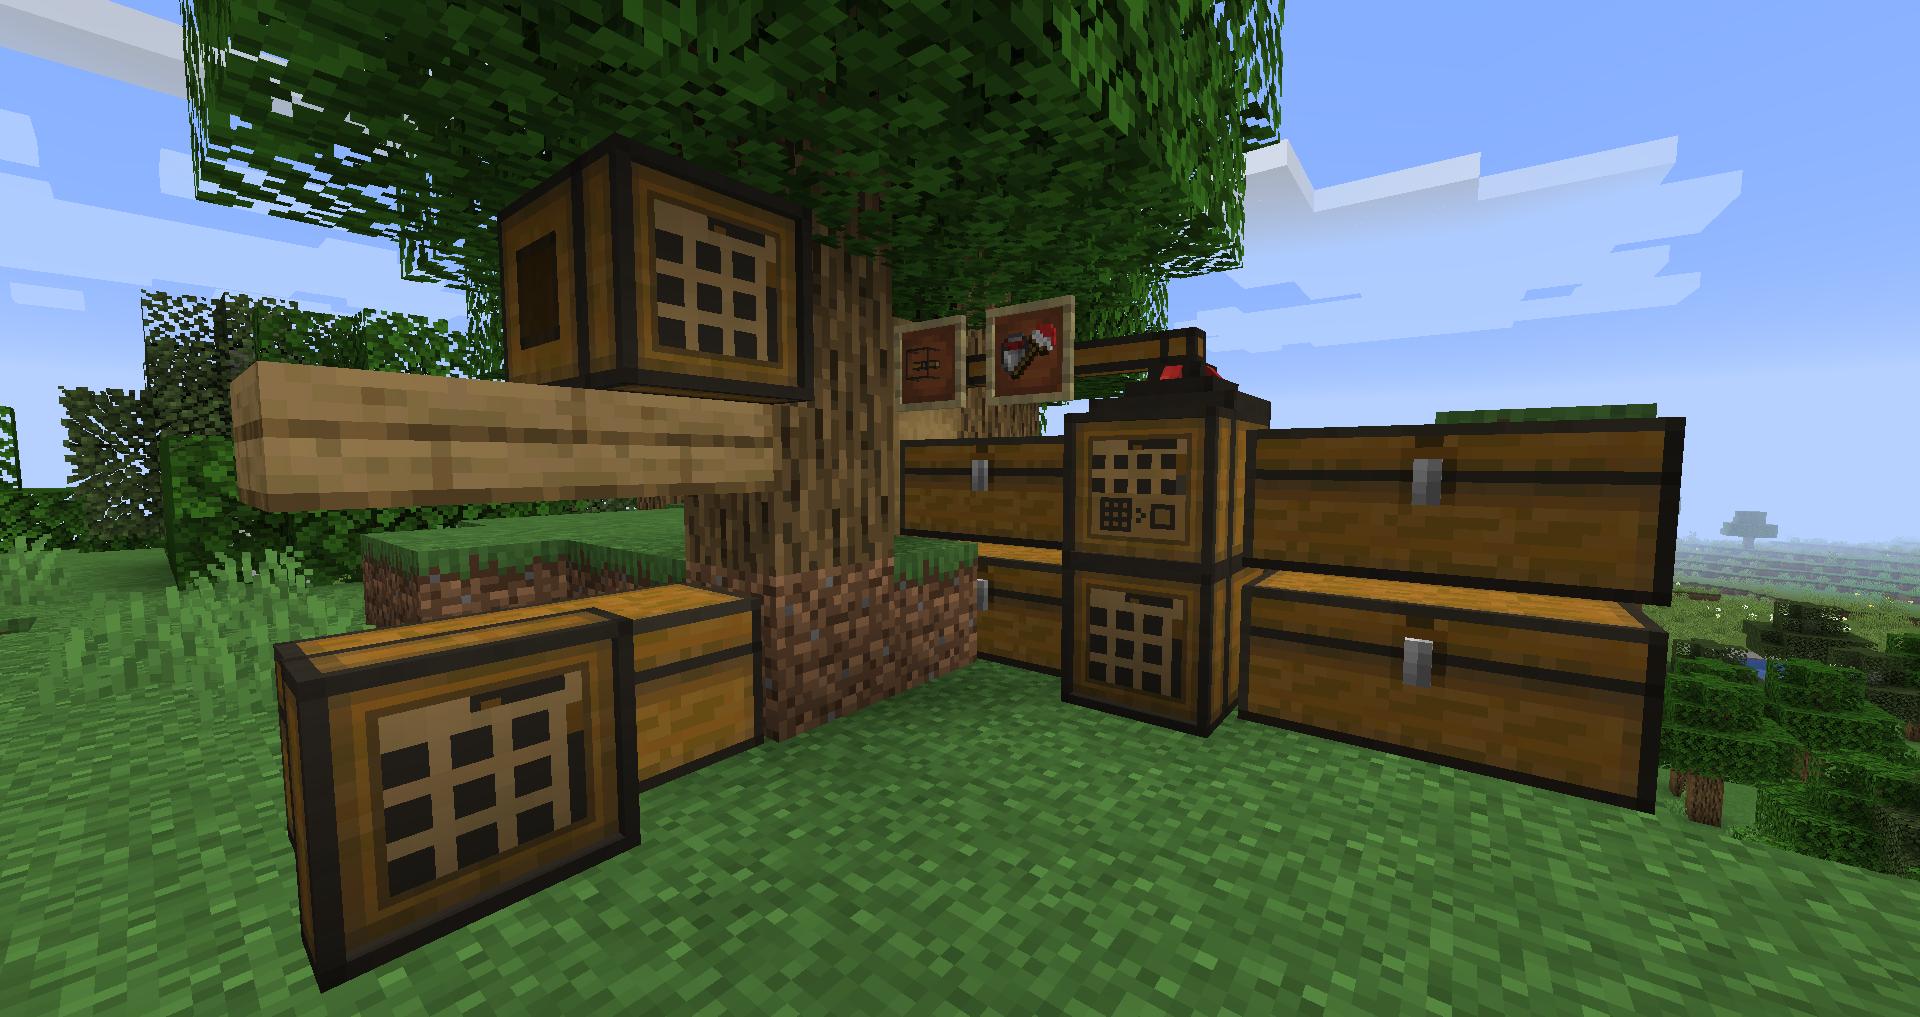 Tom s Simple Storage Mod (F Mods Minecraft CurseForge